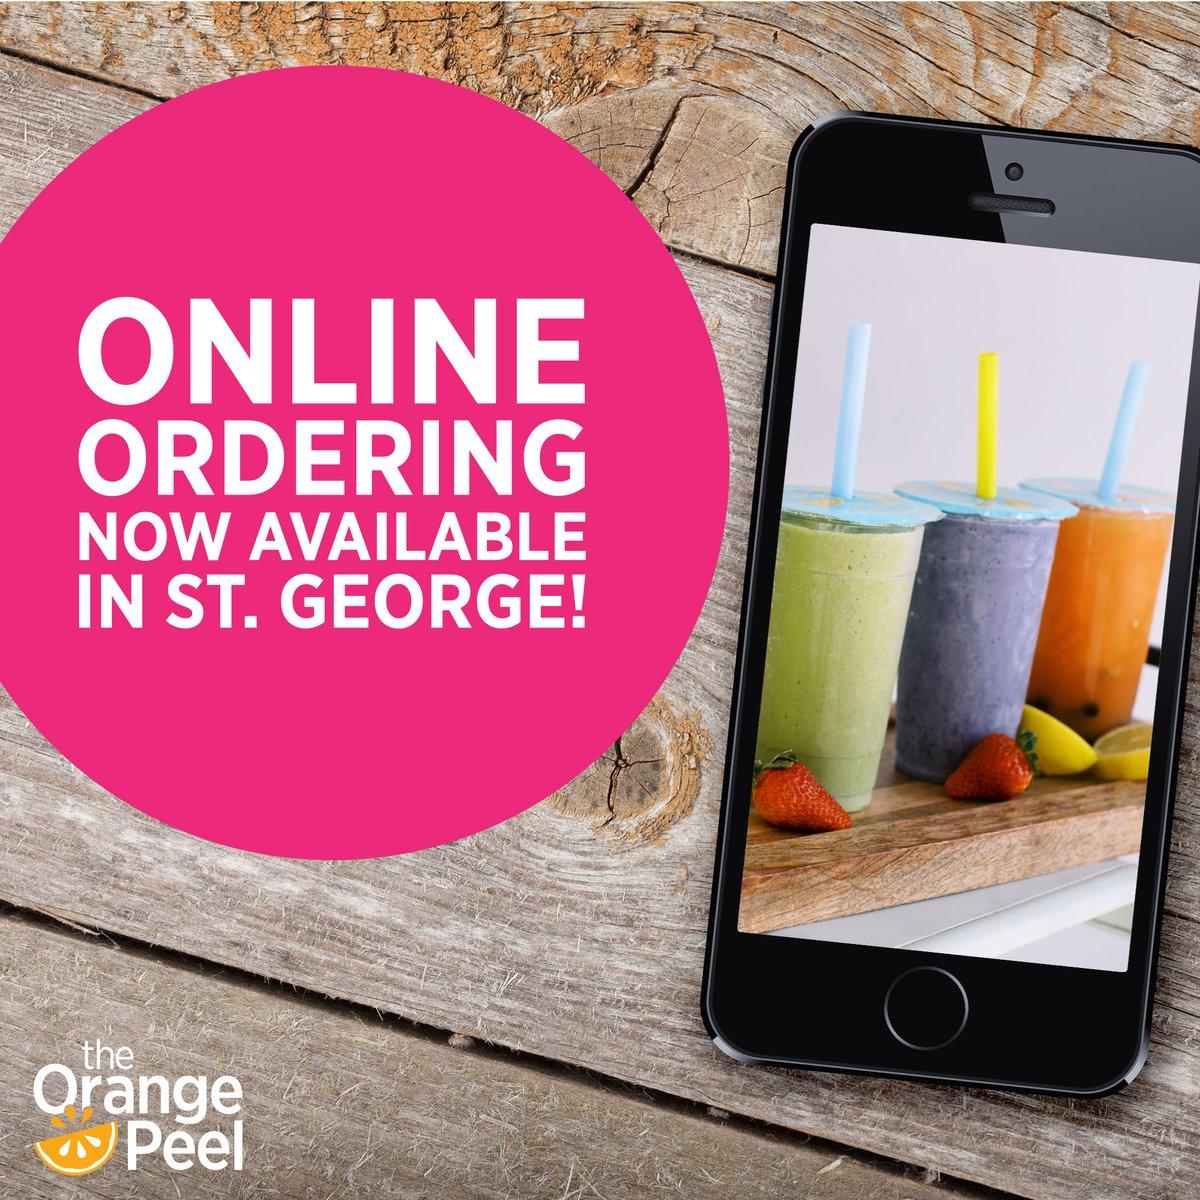 Online ordering now available for the St. George location! https://theorangepeel.biz/ #theorangepeel #stgeorgeutah #southernutah #smoothiespic.twitter.com/OcAOr6dcye